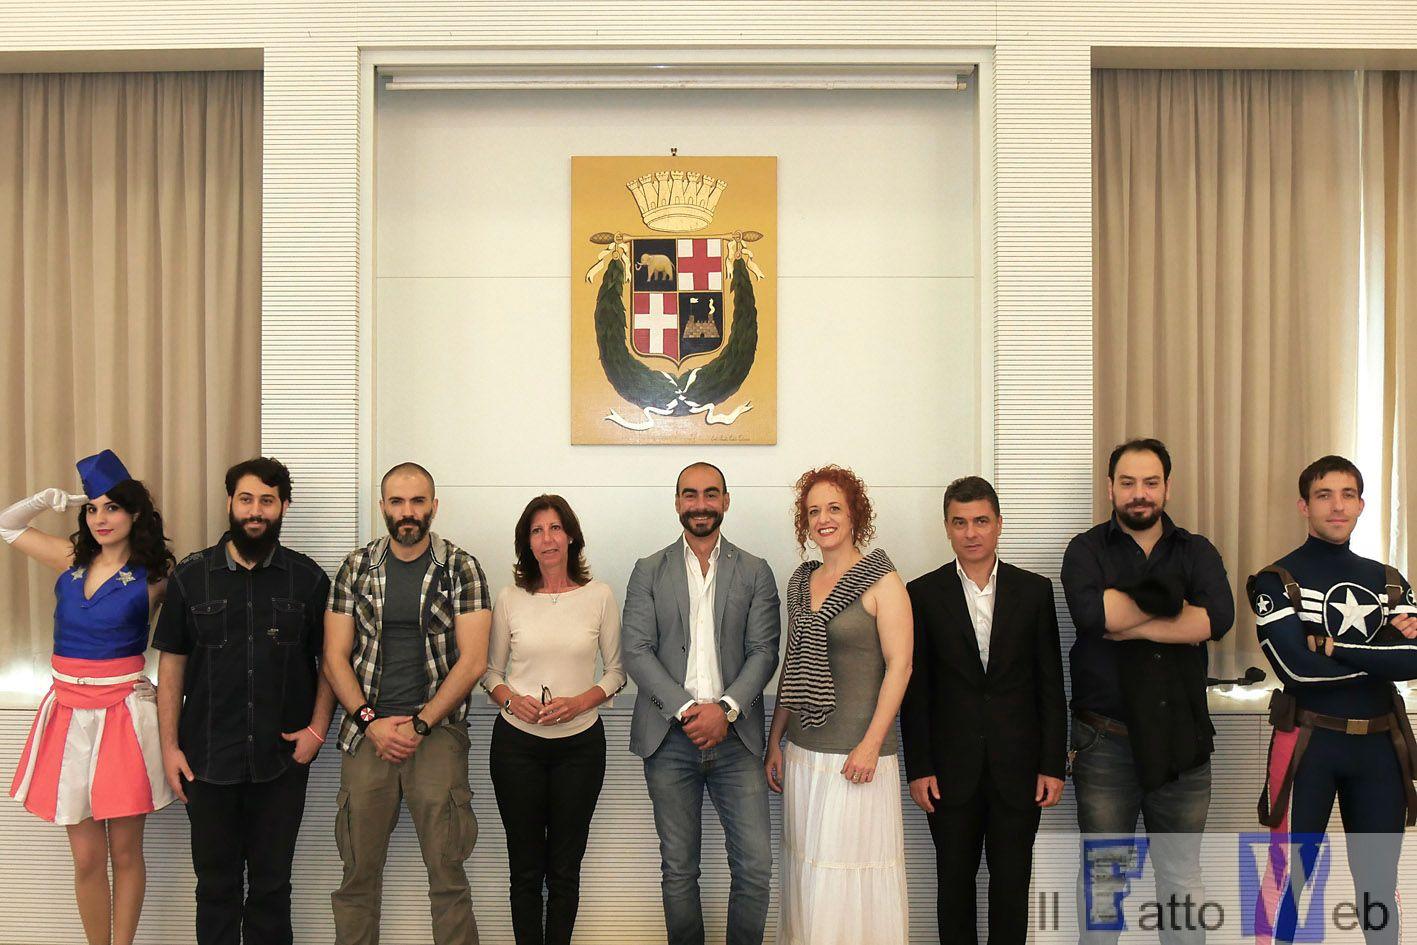 Catania Etna Comics con sessantamila presenze